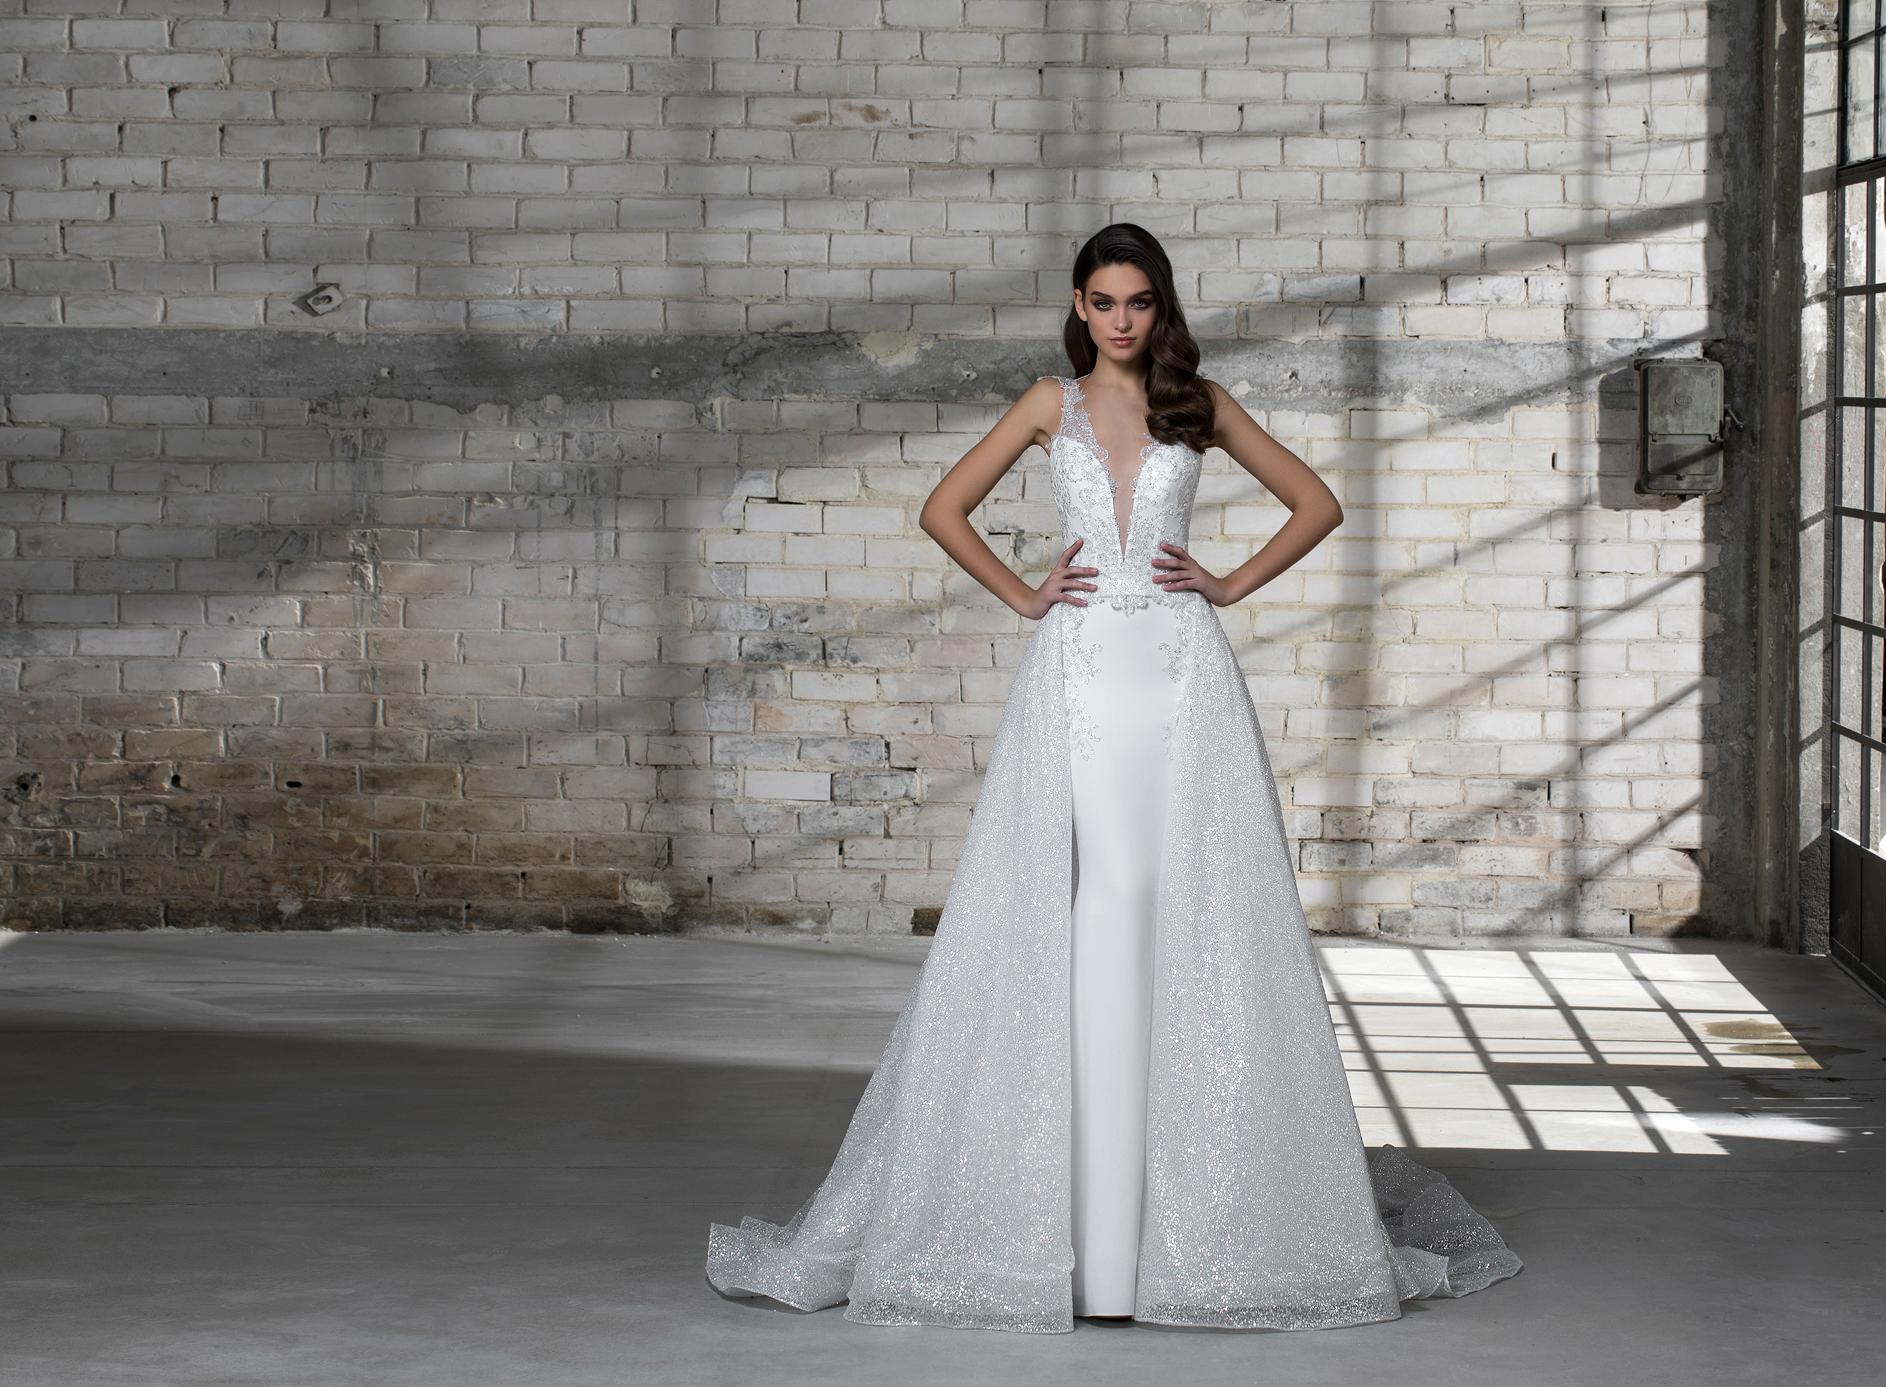 pnina tornai wedding dress spring 2019 ball gown sleeveless